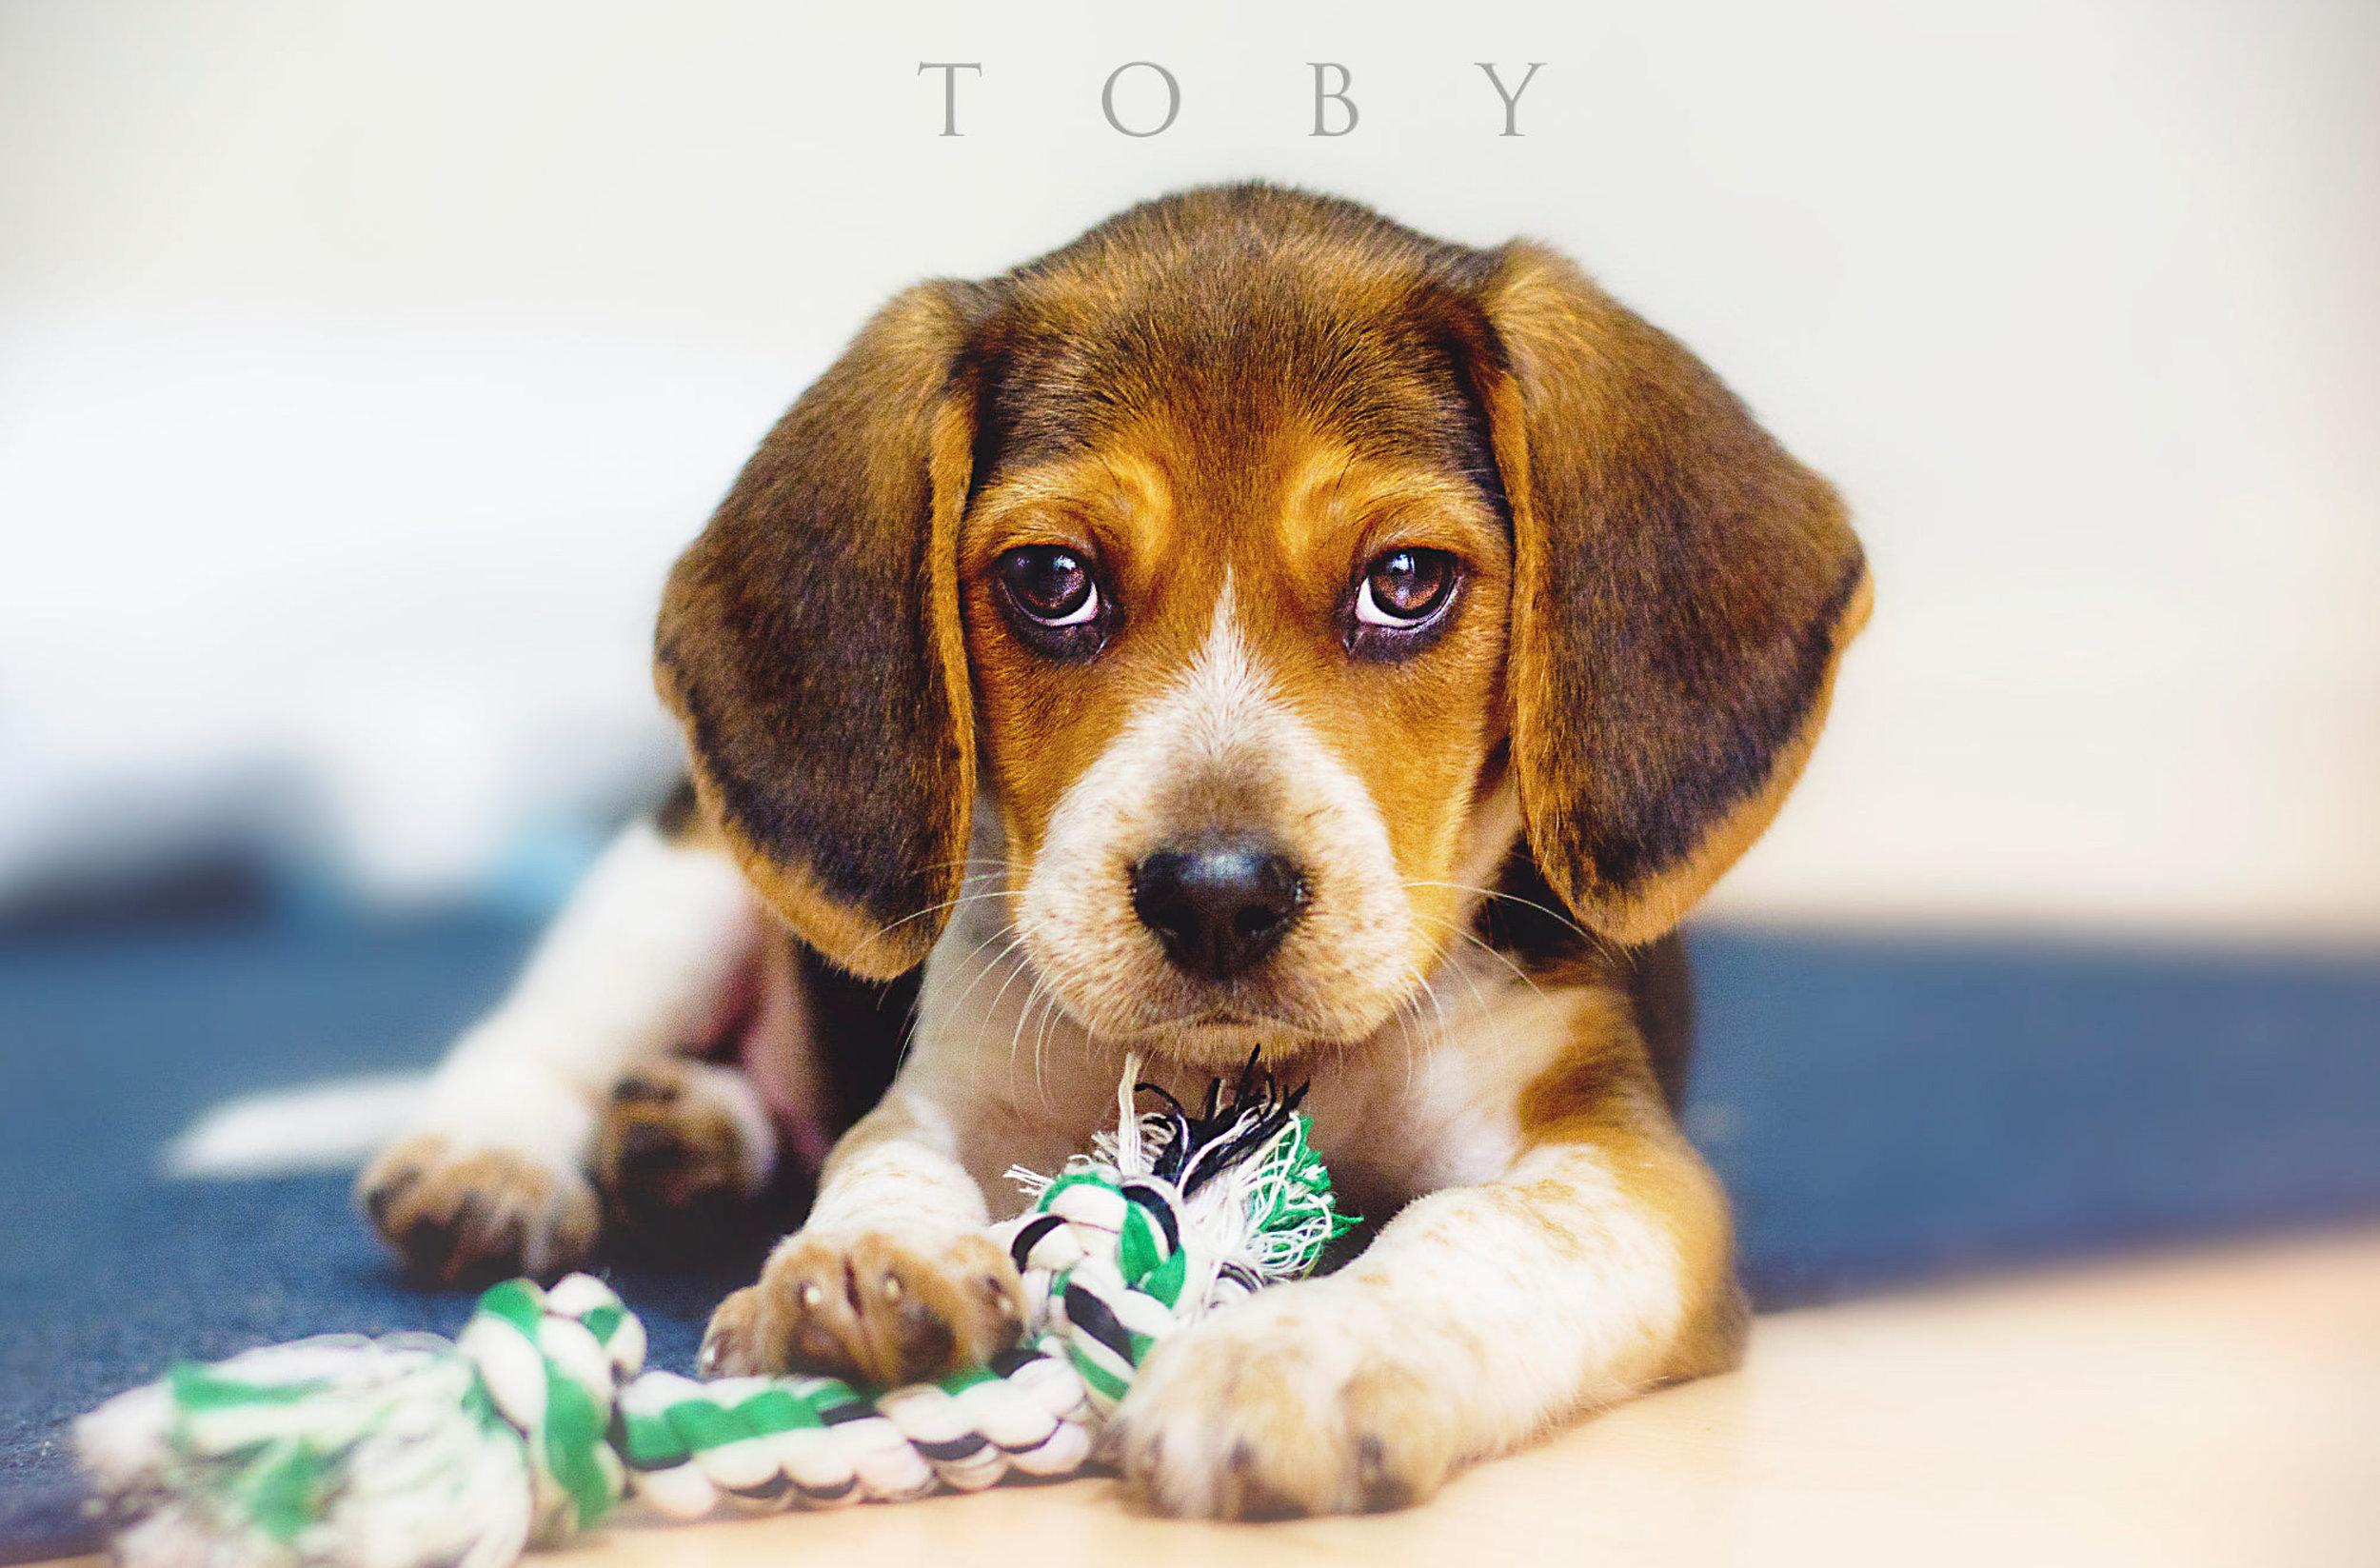 Toby01.jpg